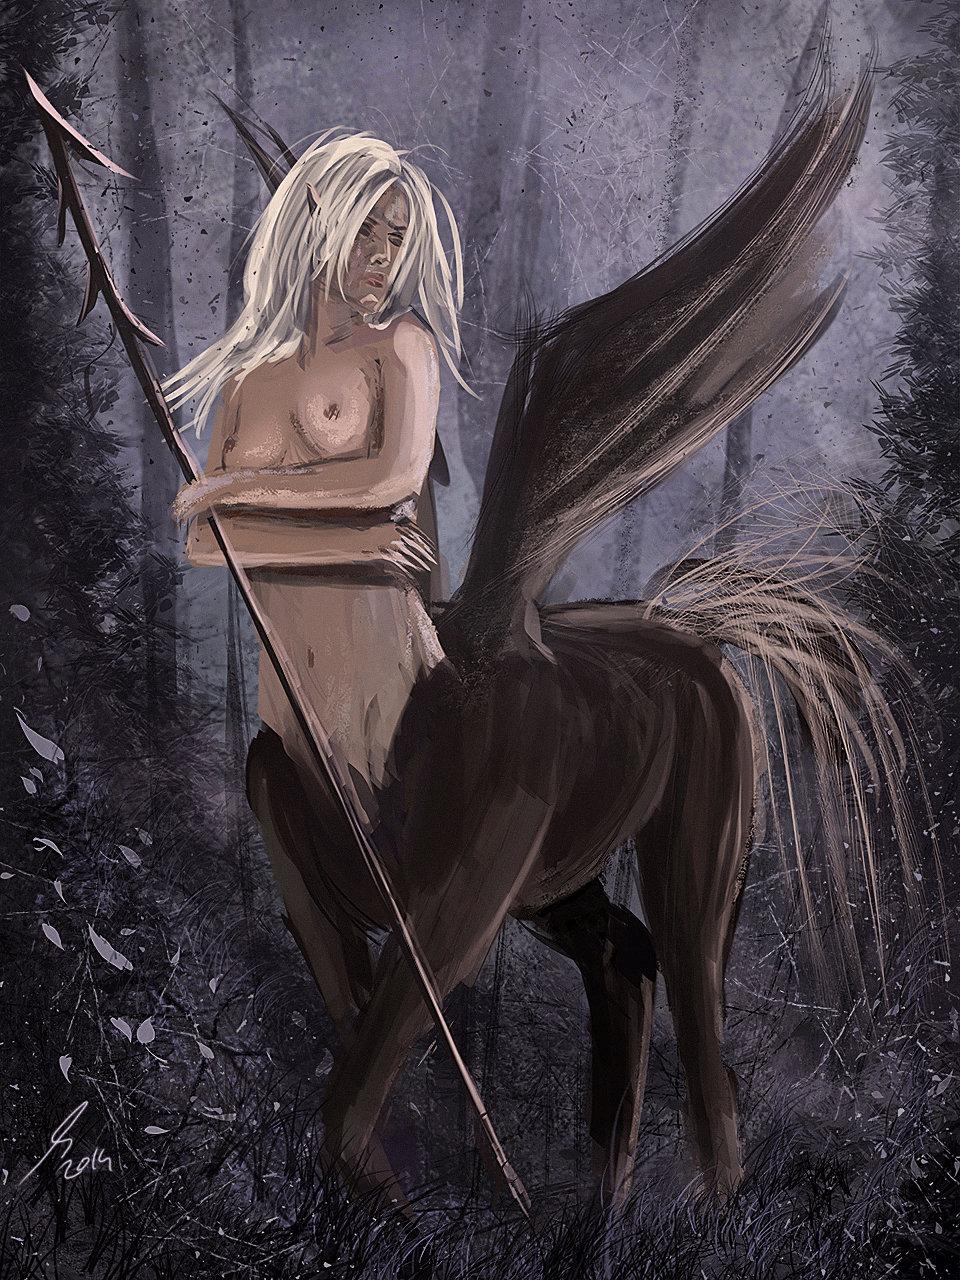 Raistlin majere winged centaur render